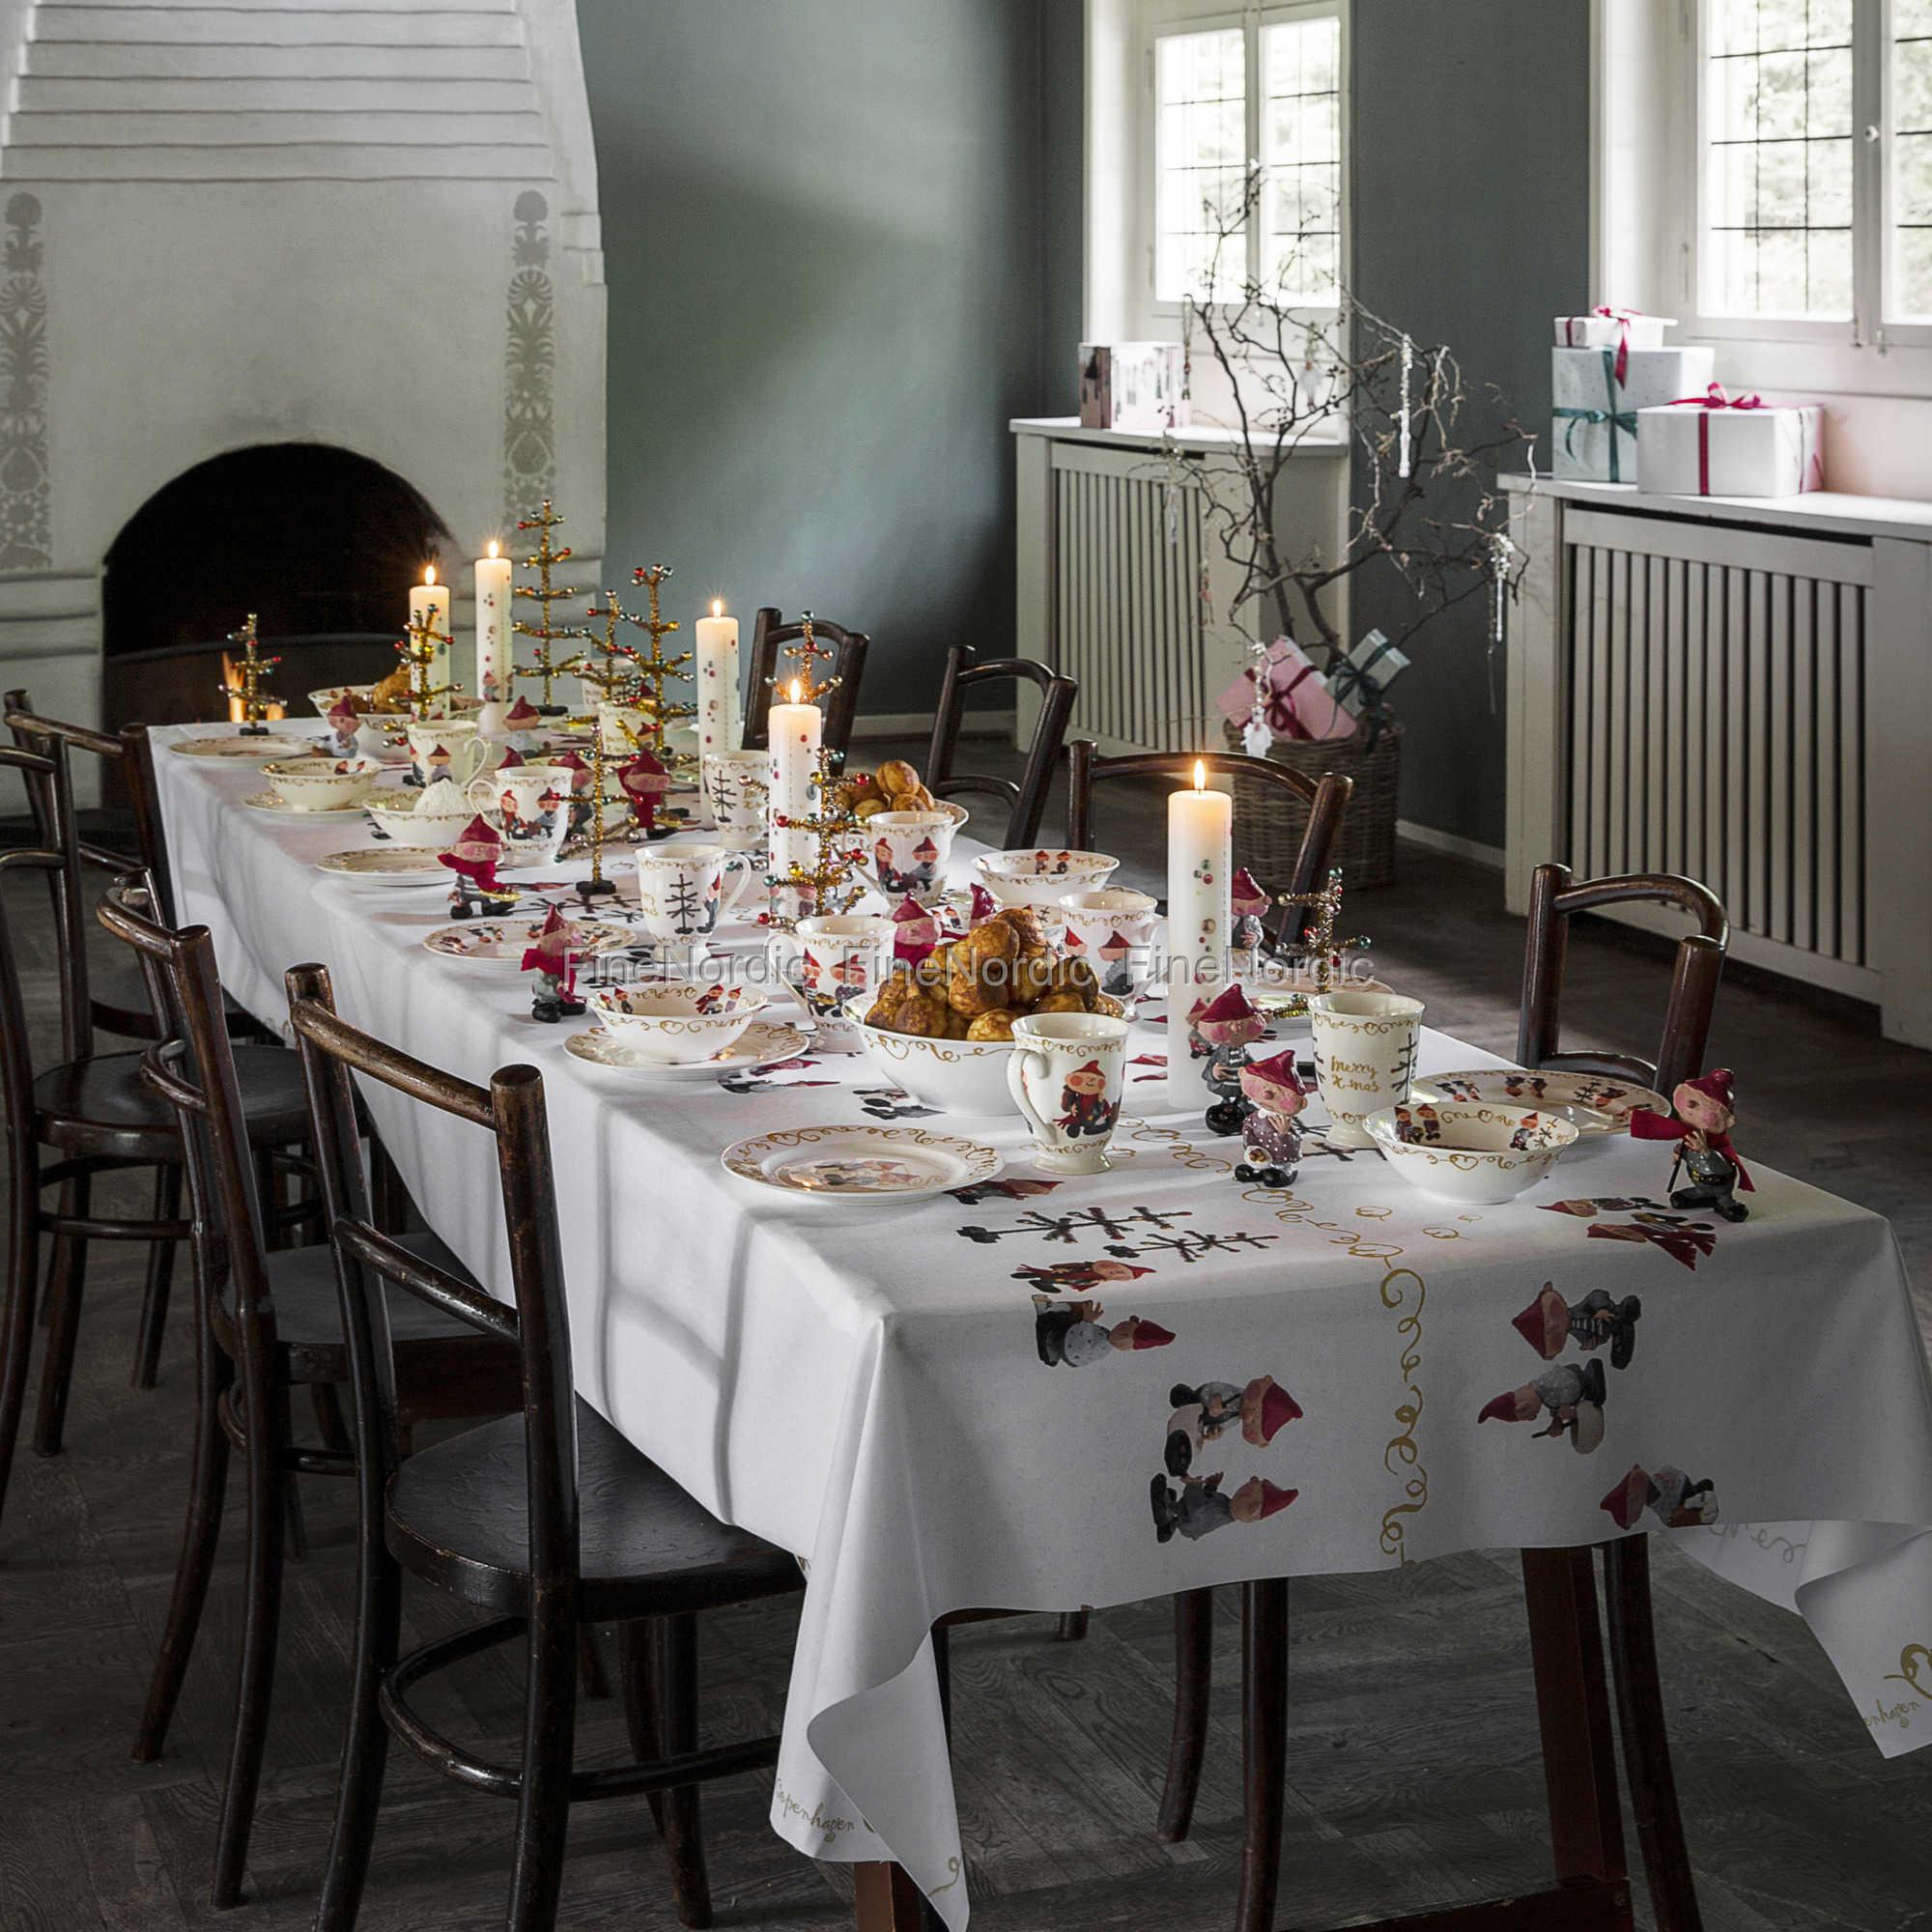 medusa copenhagen nisling tischtuch preis pro meter. Black Bedroom Furniture Sets. Home Design Ideas